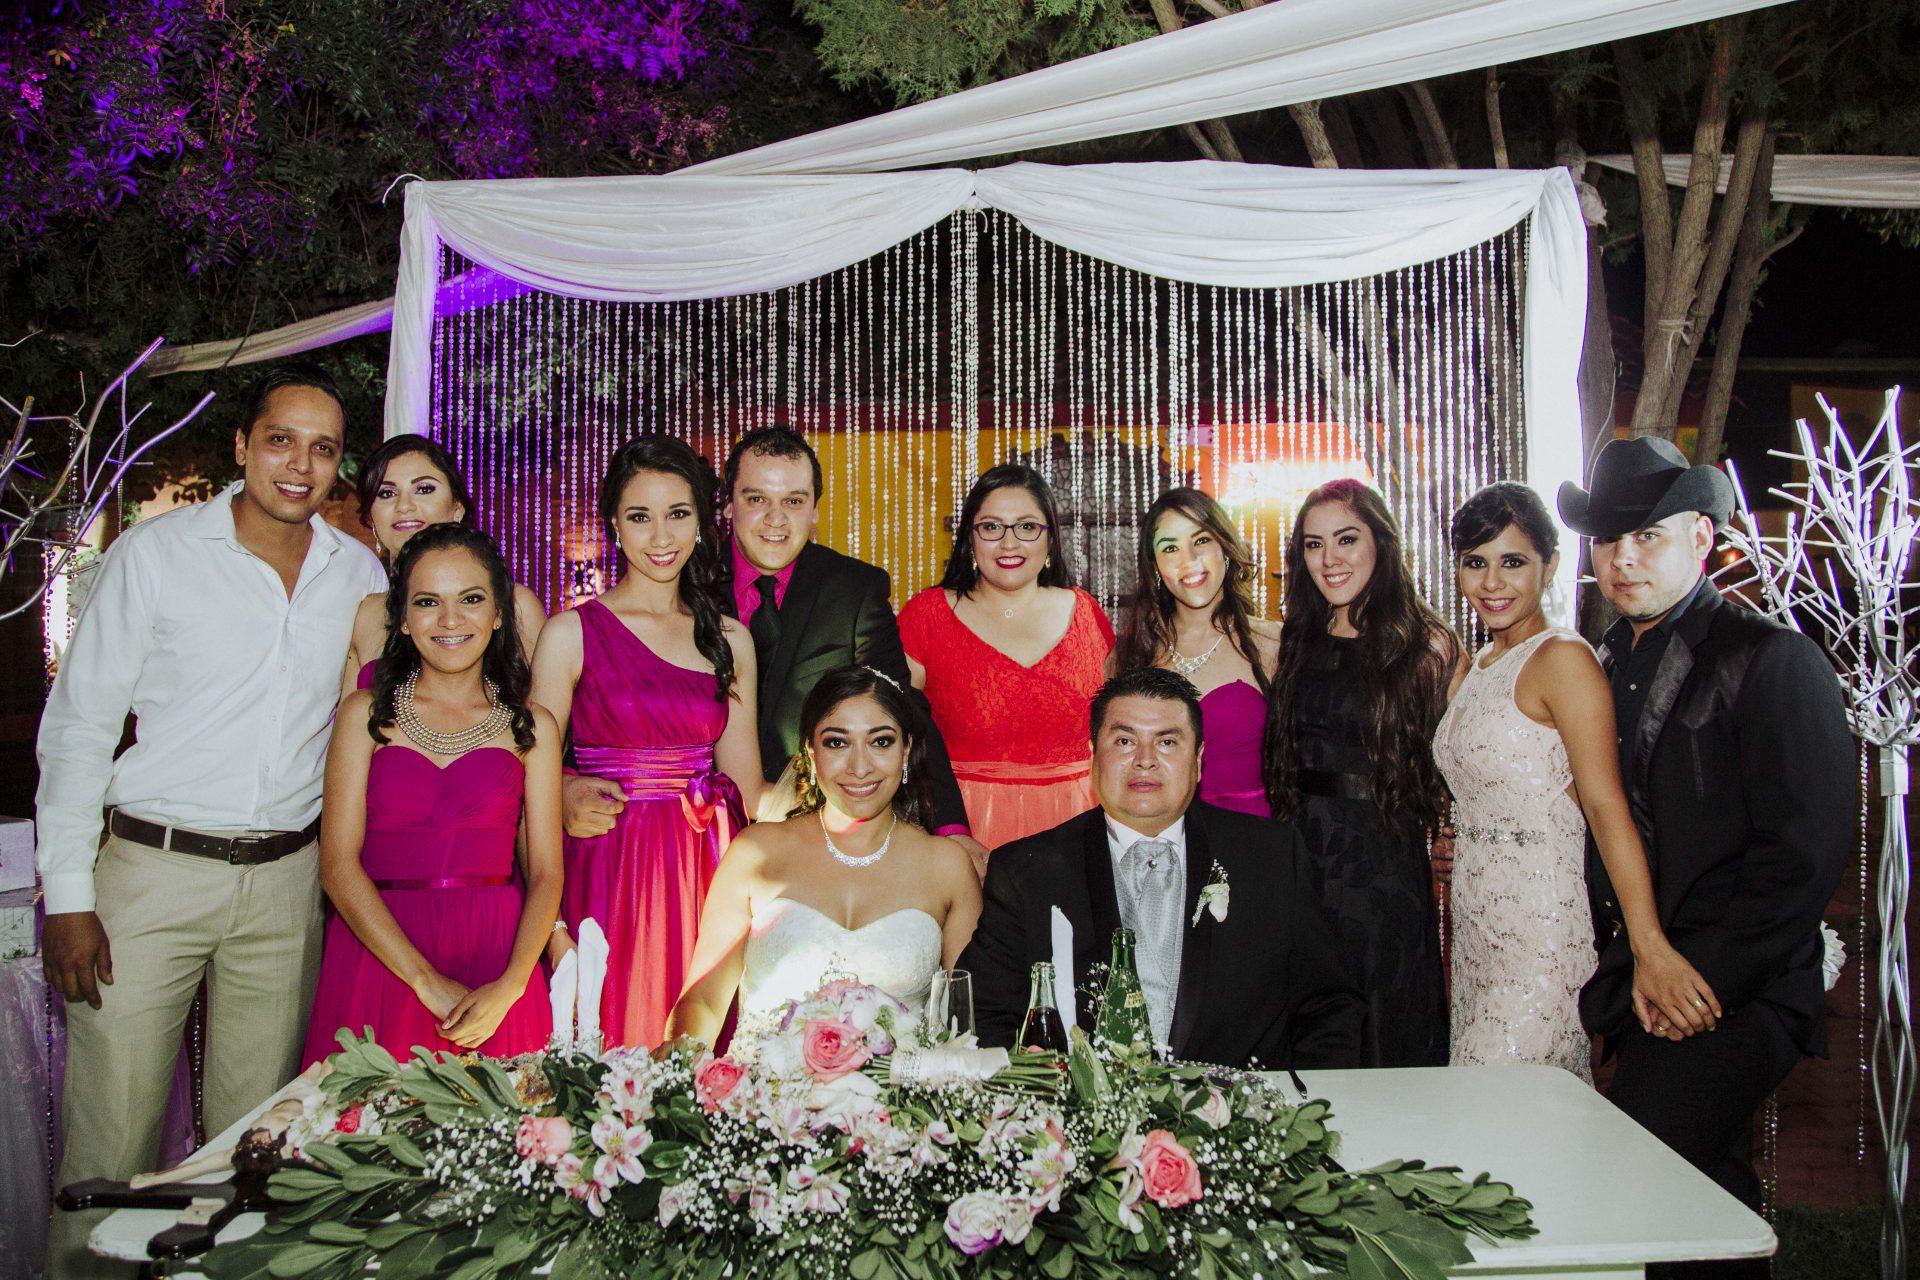 fotografo_profesional_zacatecas_chihuahua_bodas_xv_mexico-55